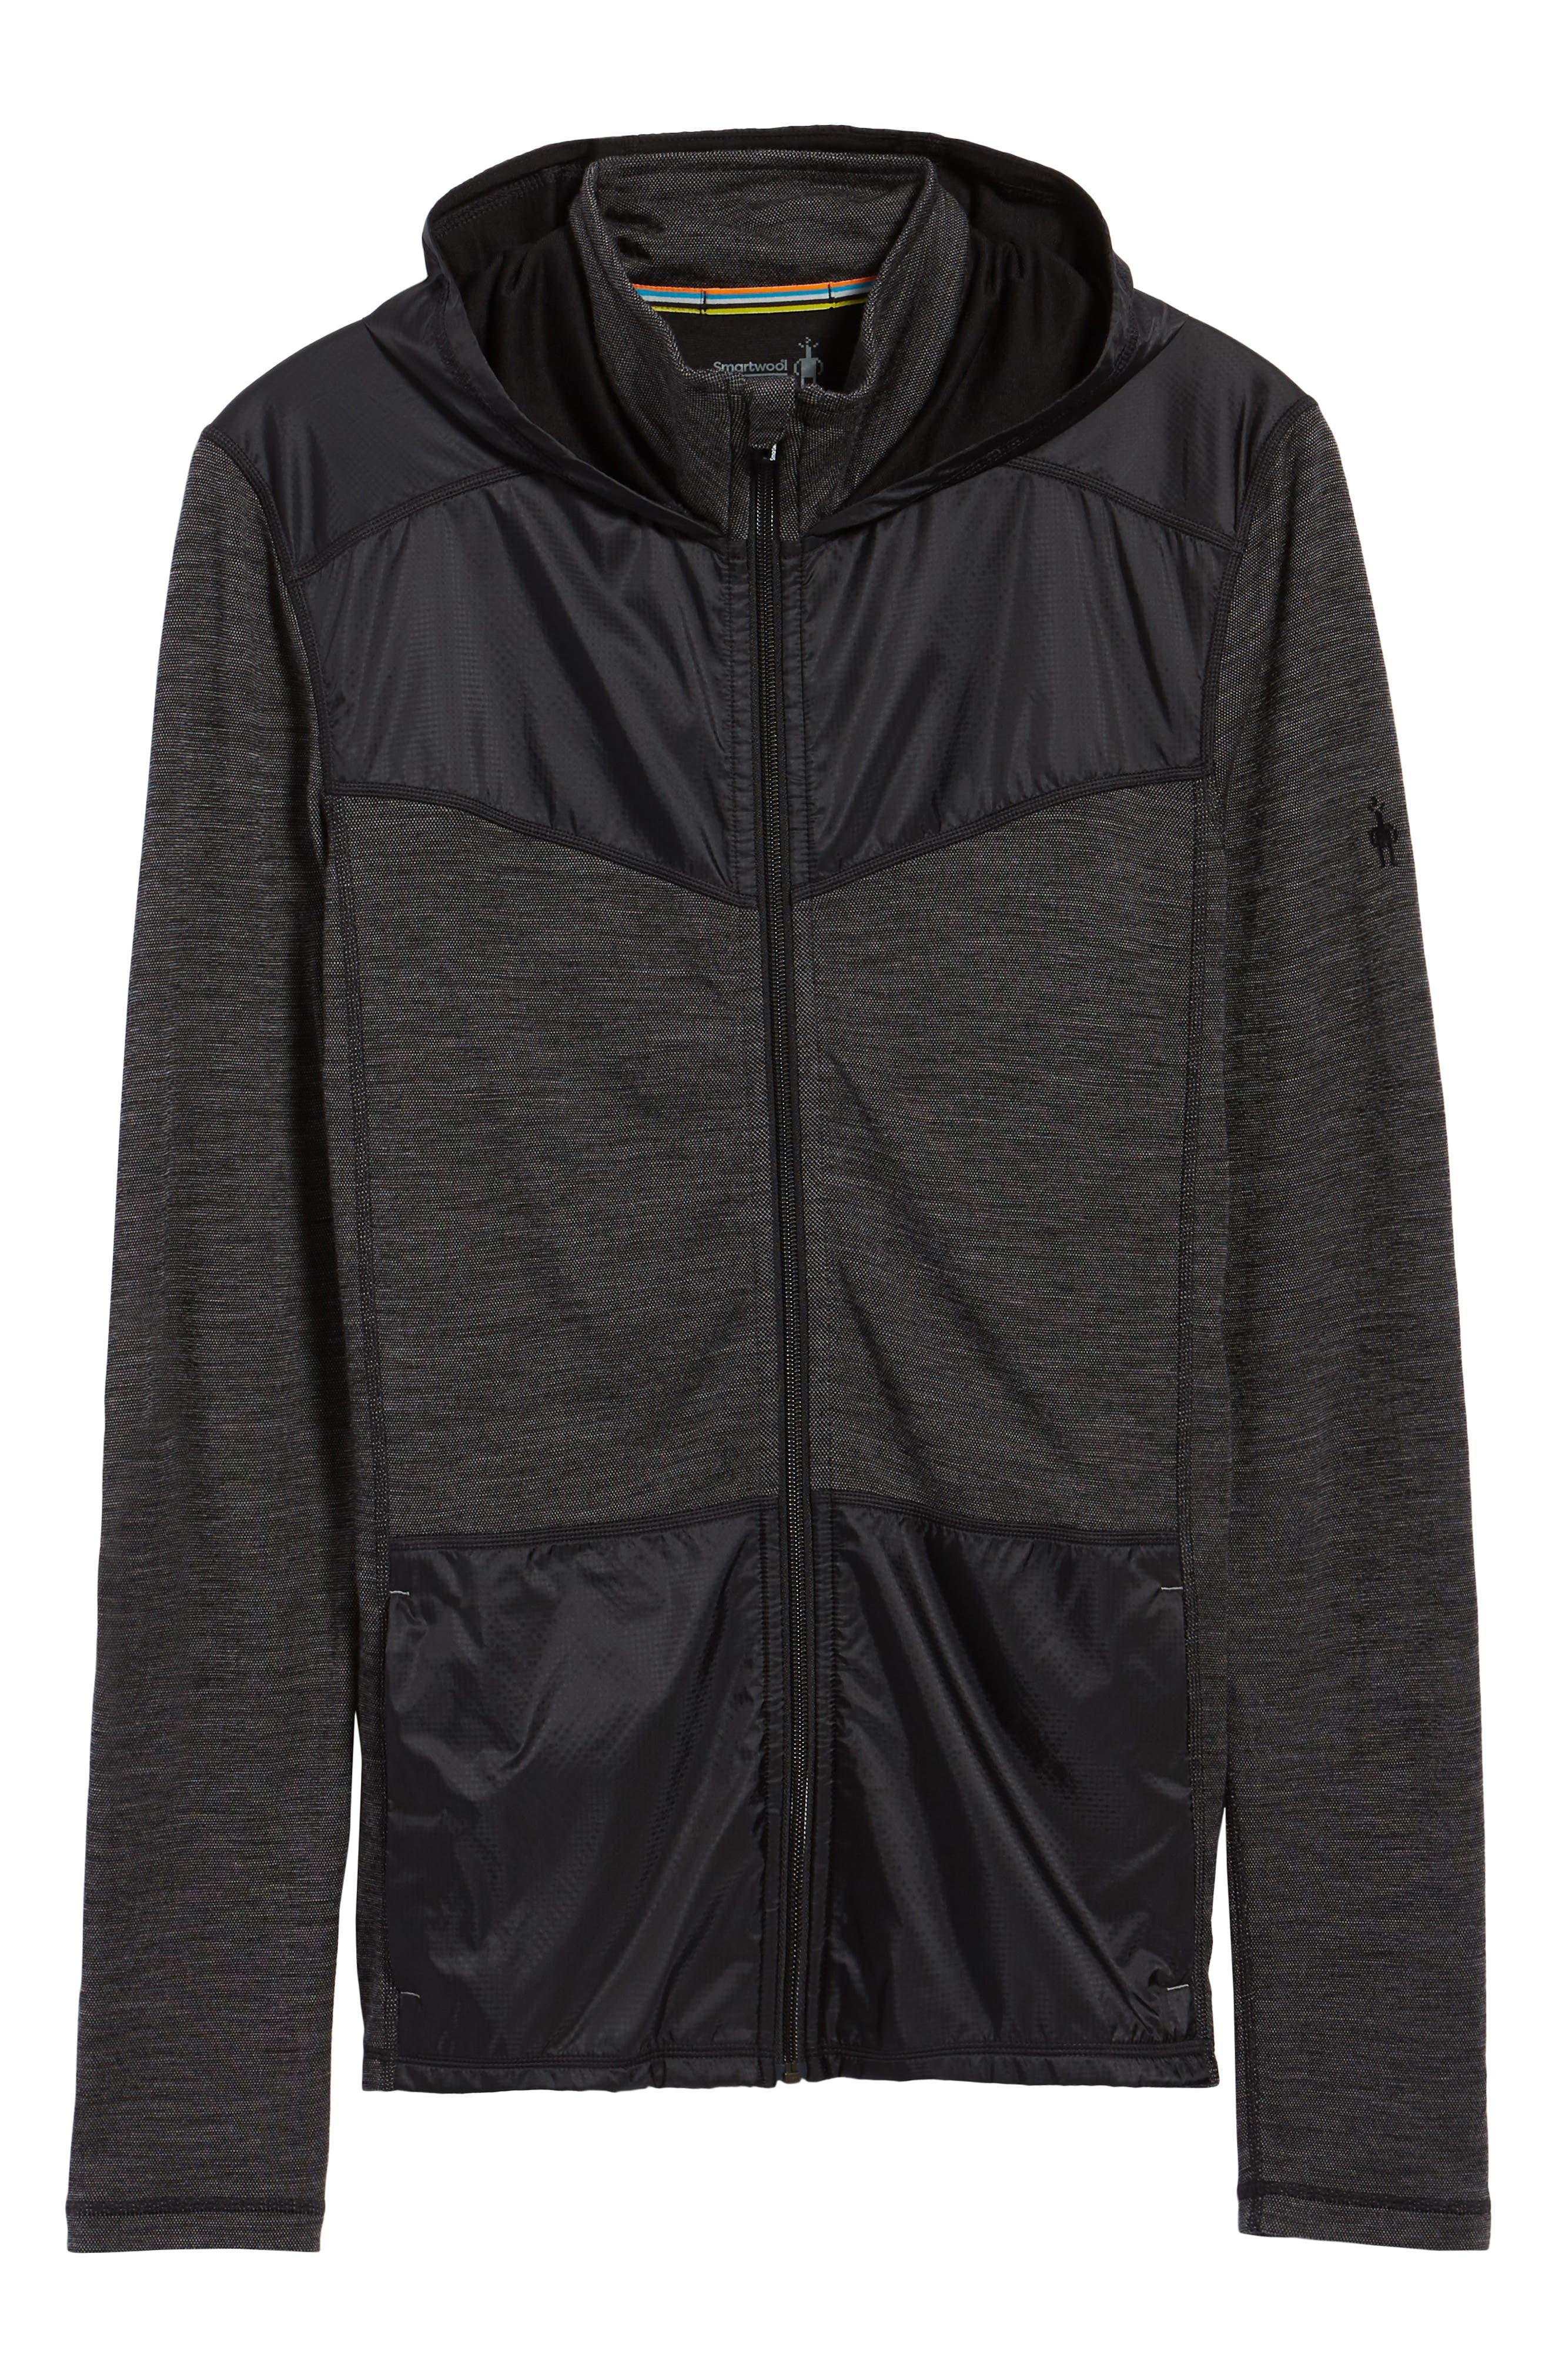 250 Sport Merino Wool Jacket,                             Alternate thumbnail 6, color,                             001